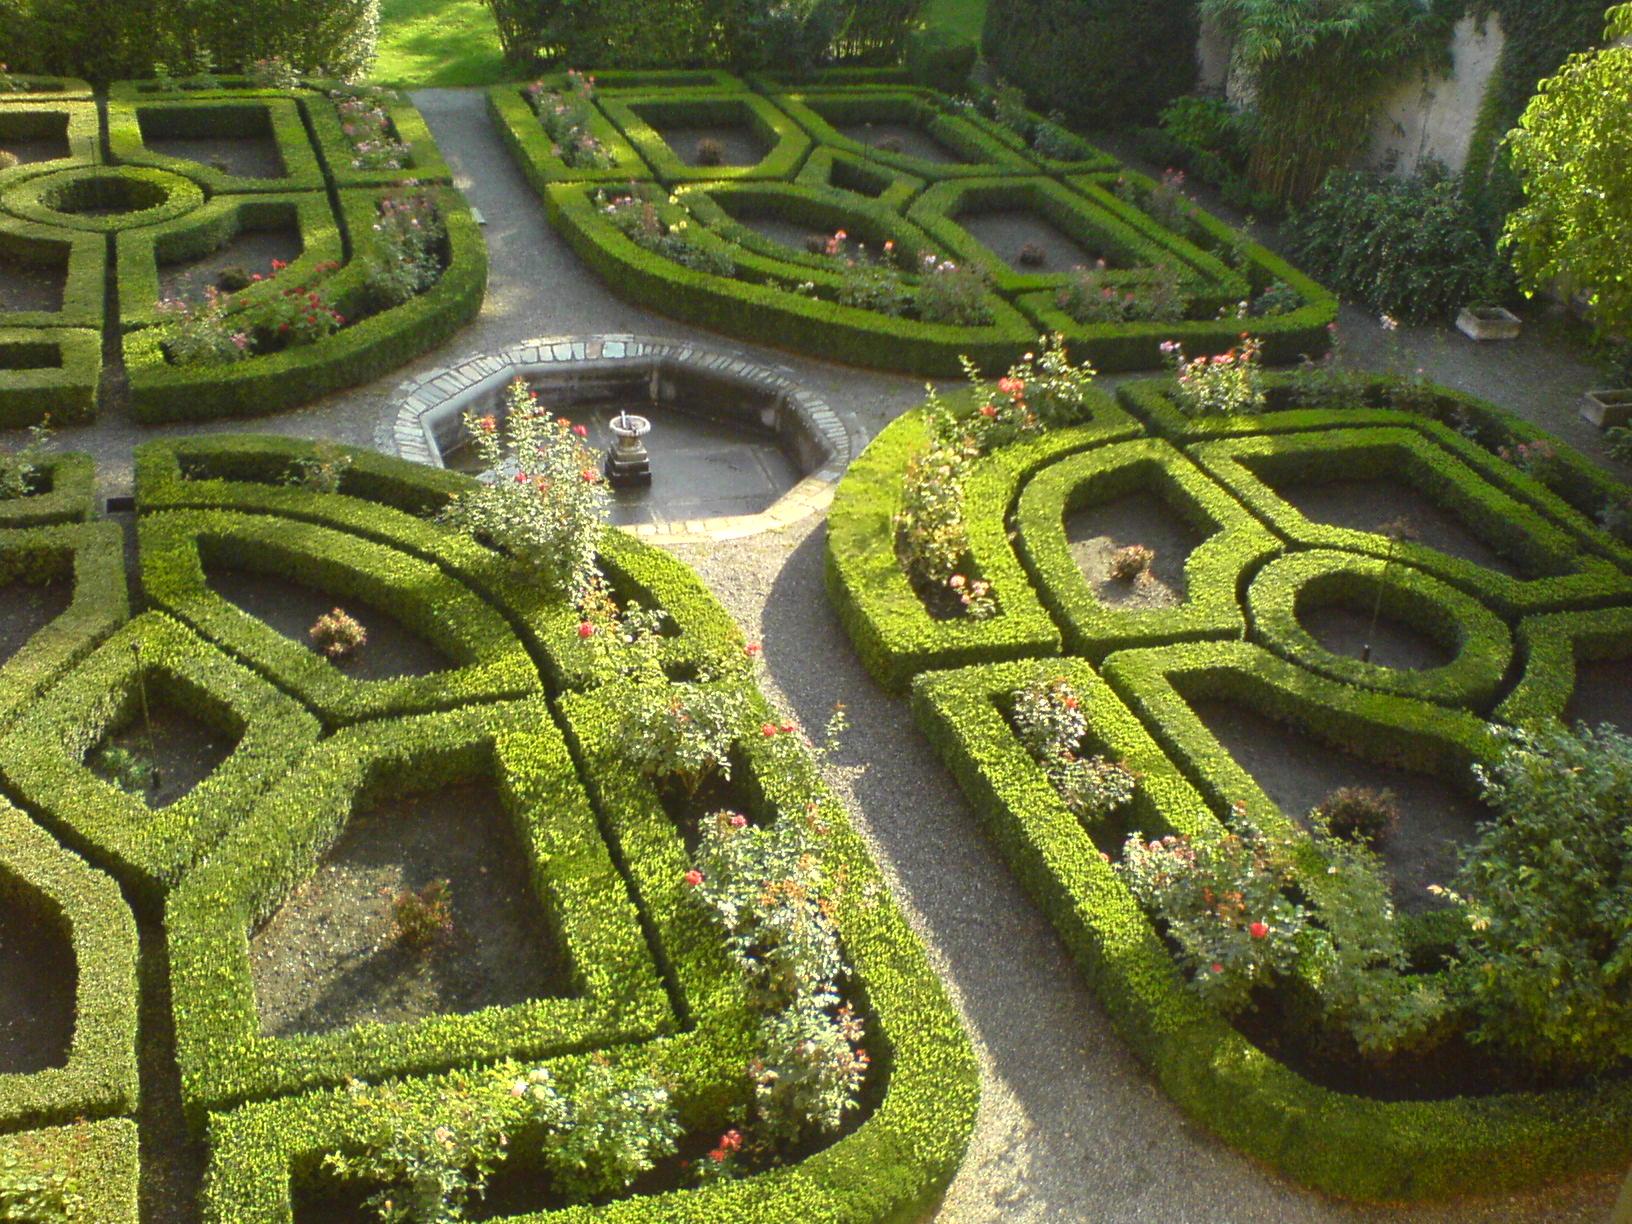 File giardino all 39 italiana jpg wikimedia commons - Giardino all italiana ...